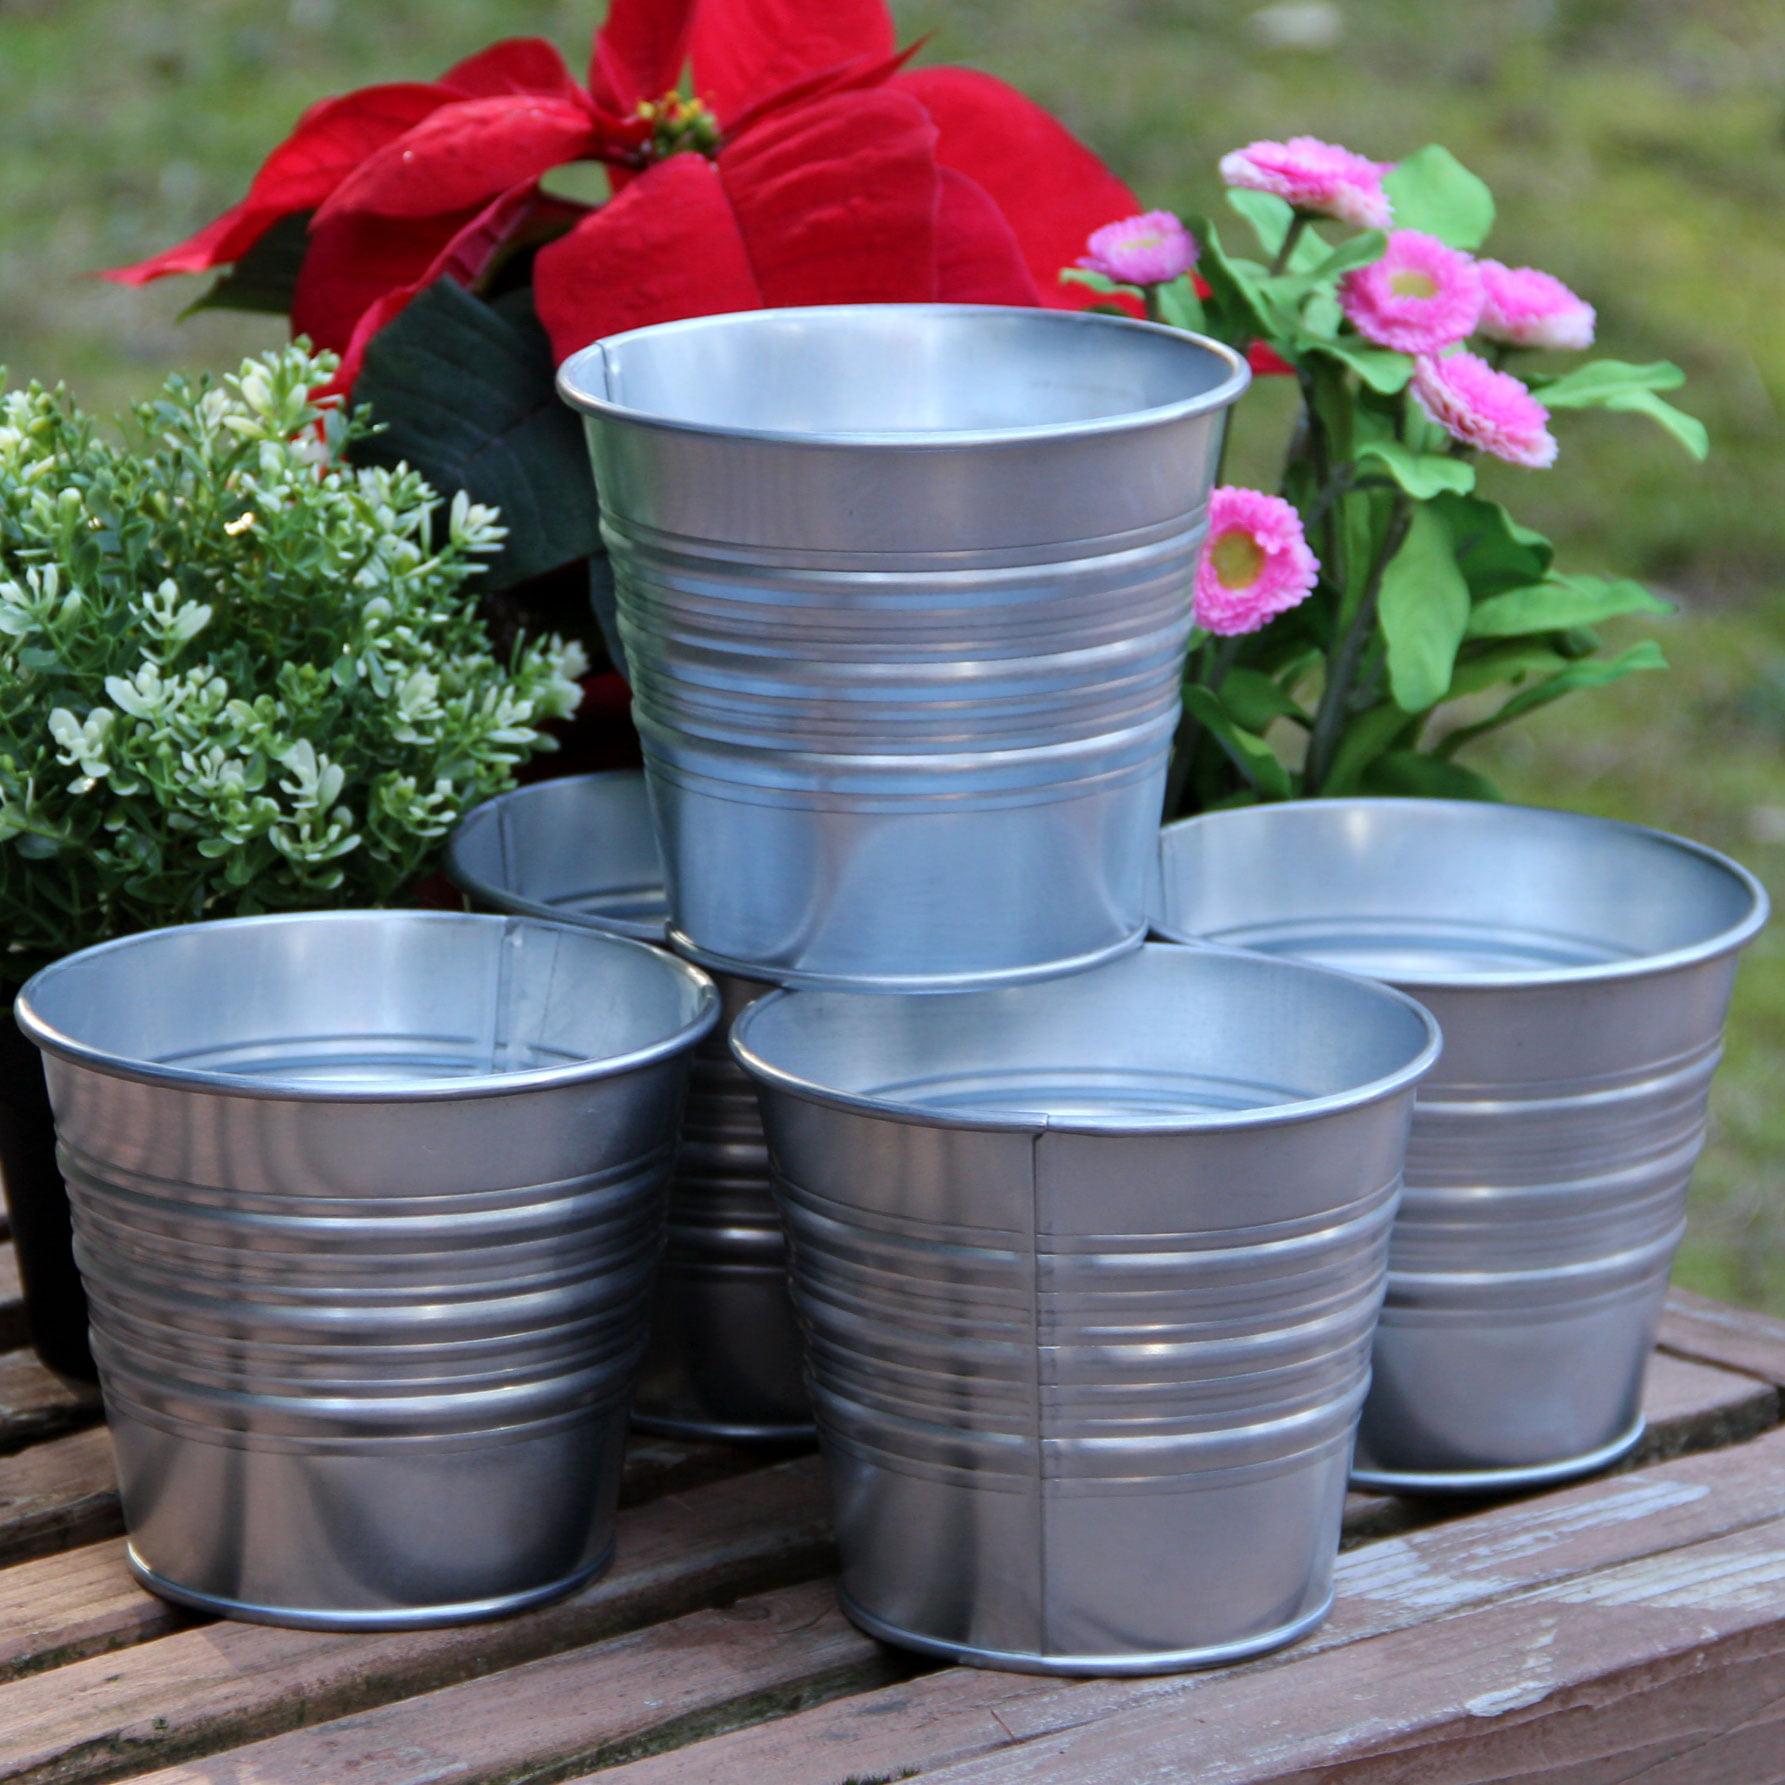 Galvanized Basket Bucket Planters Pot Metal Set Of 5 For Plant And Flower Walmart Com Walmart Com